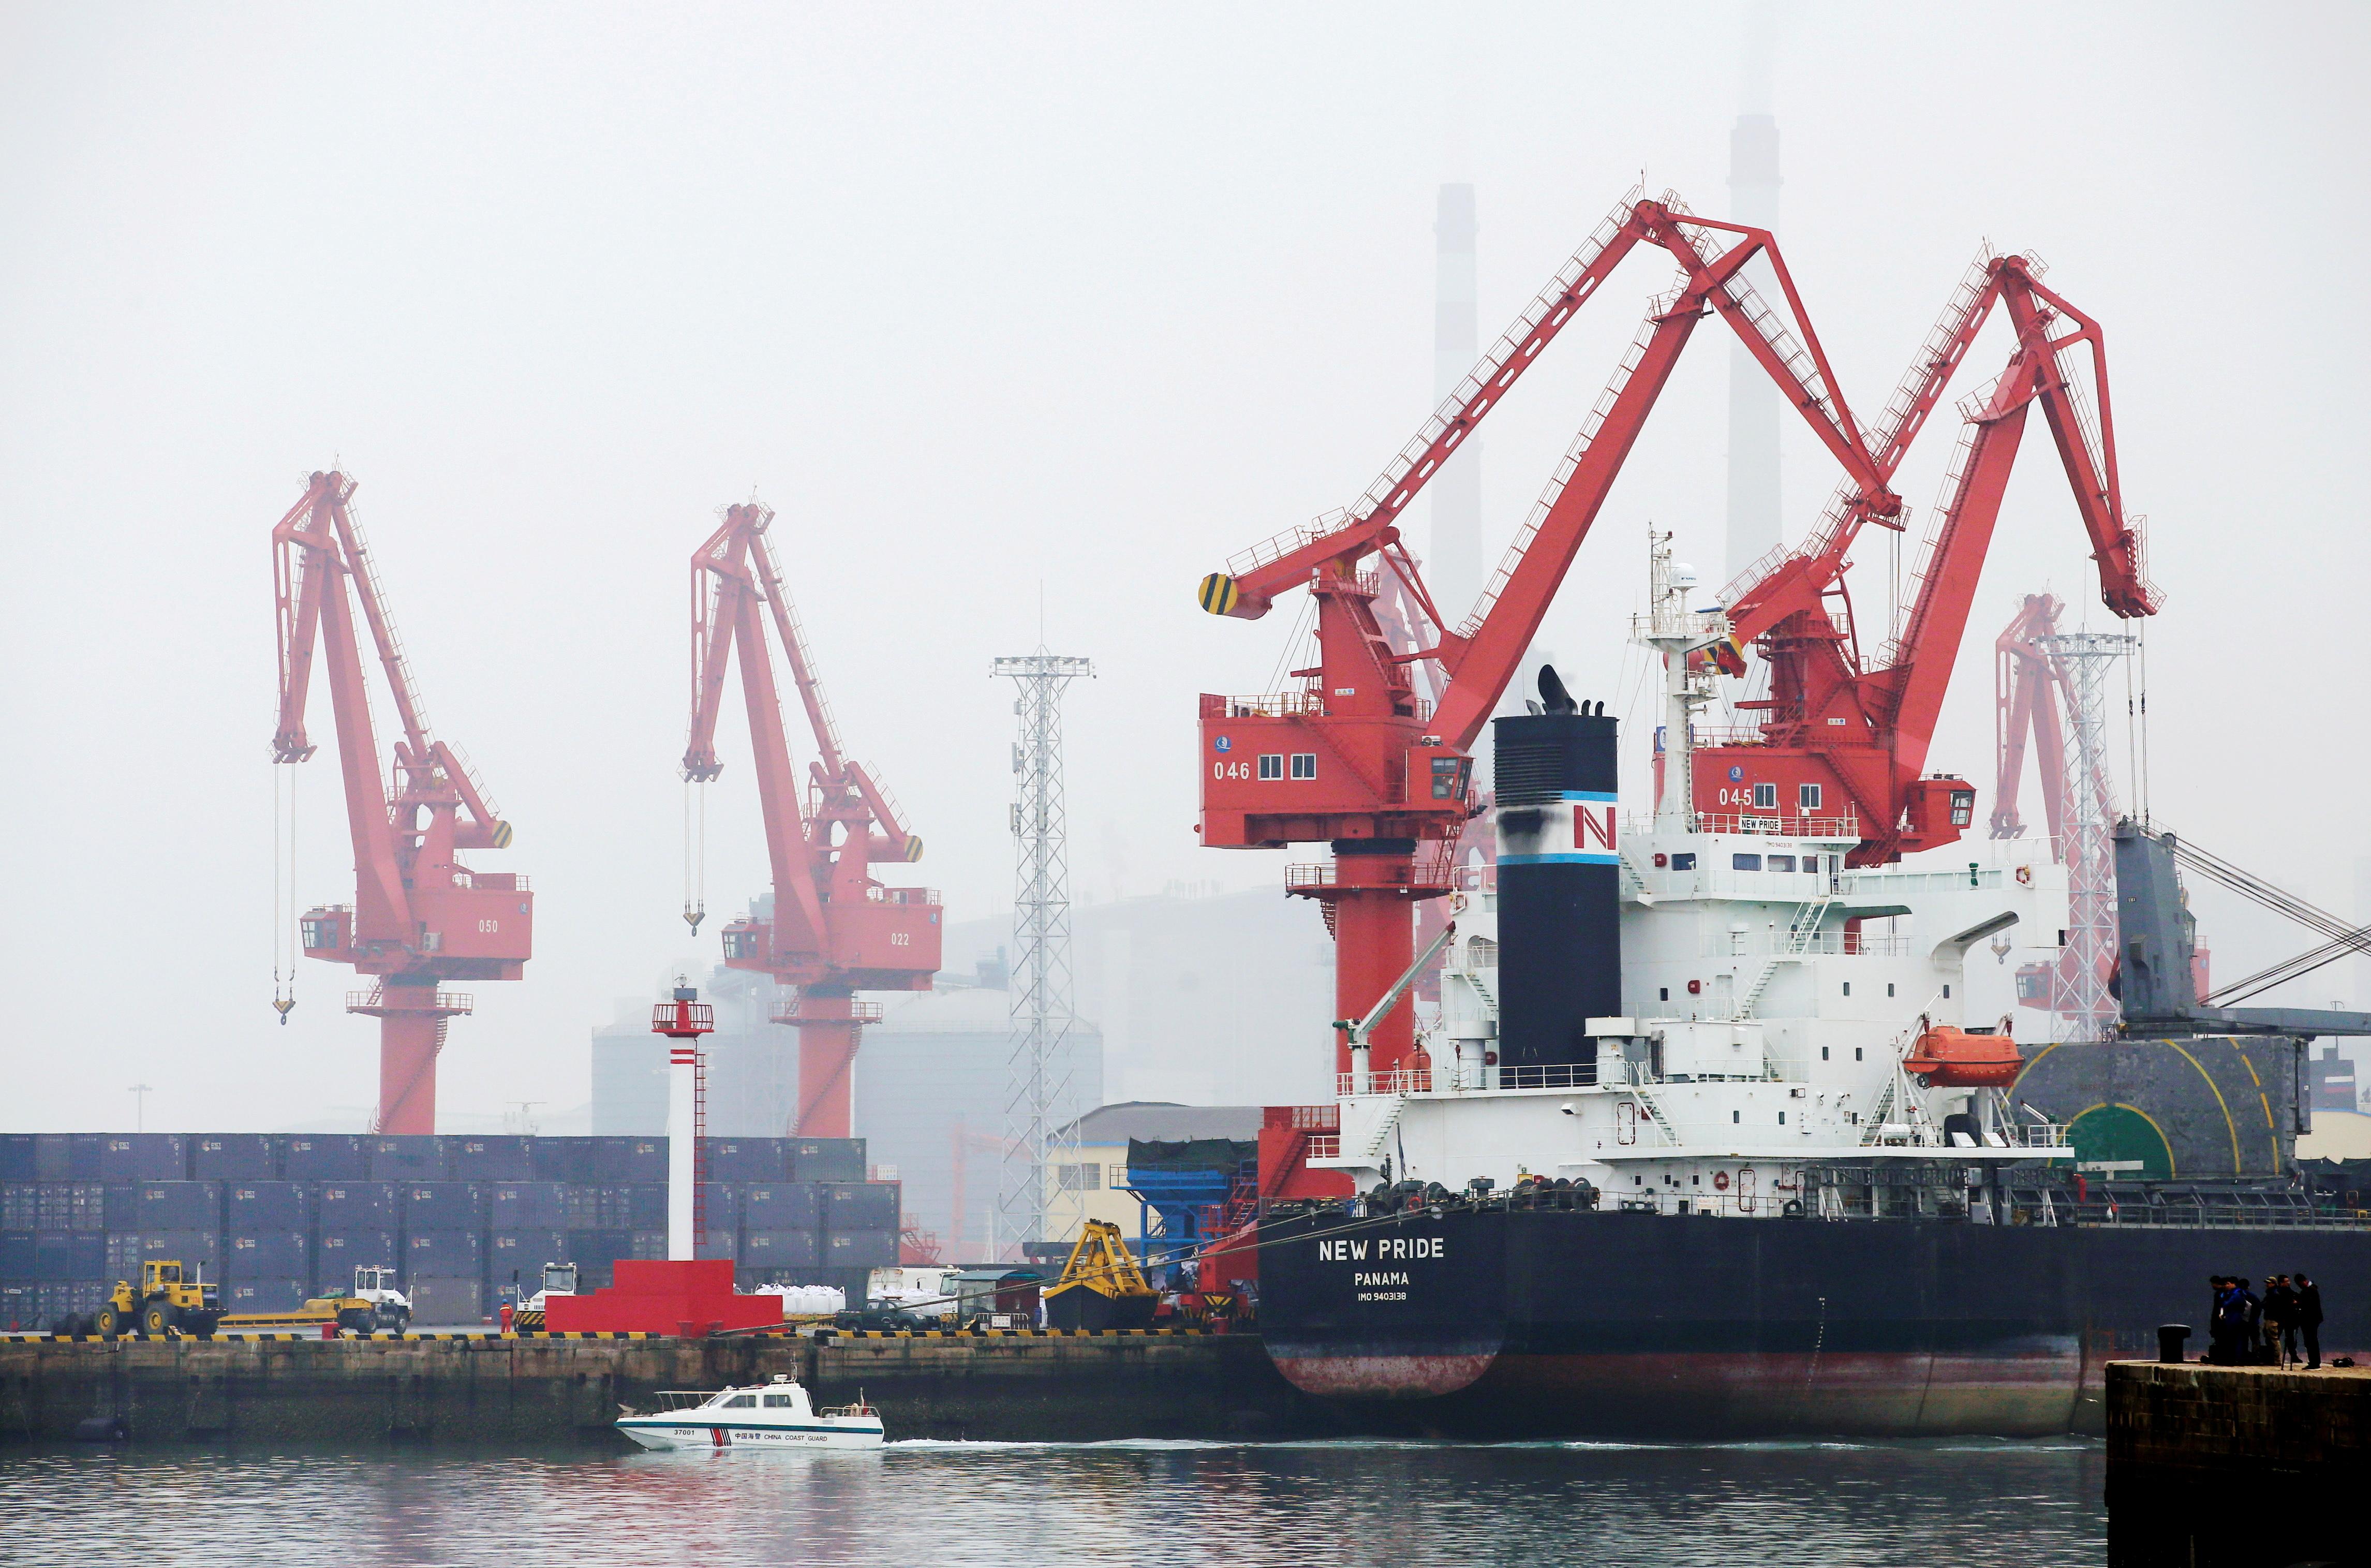 A crude oil tanker is seen at Qingdao Port, Shandong province, China, April 21, 2019. REUTERS/Jason Lee